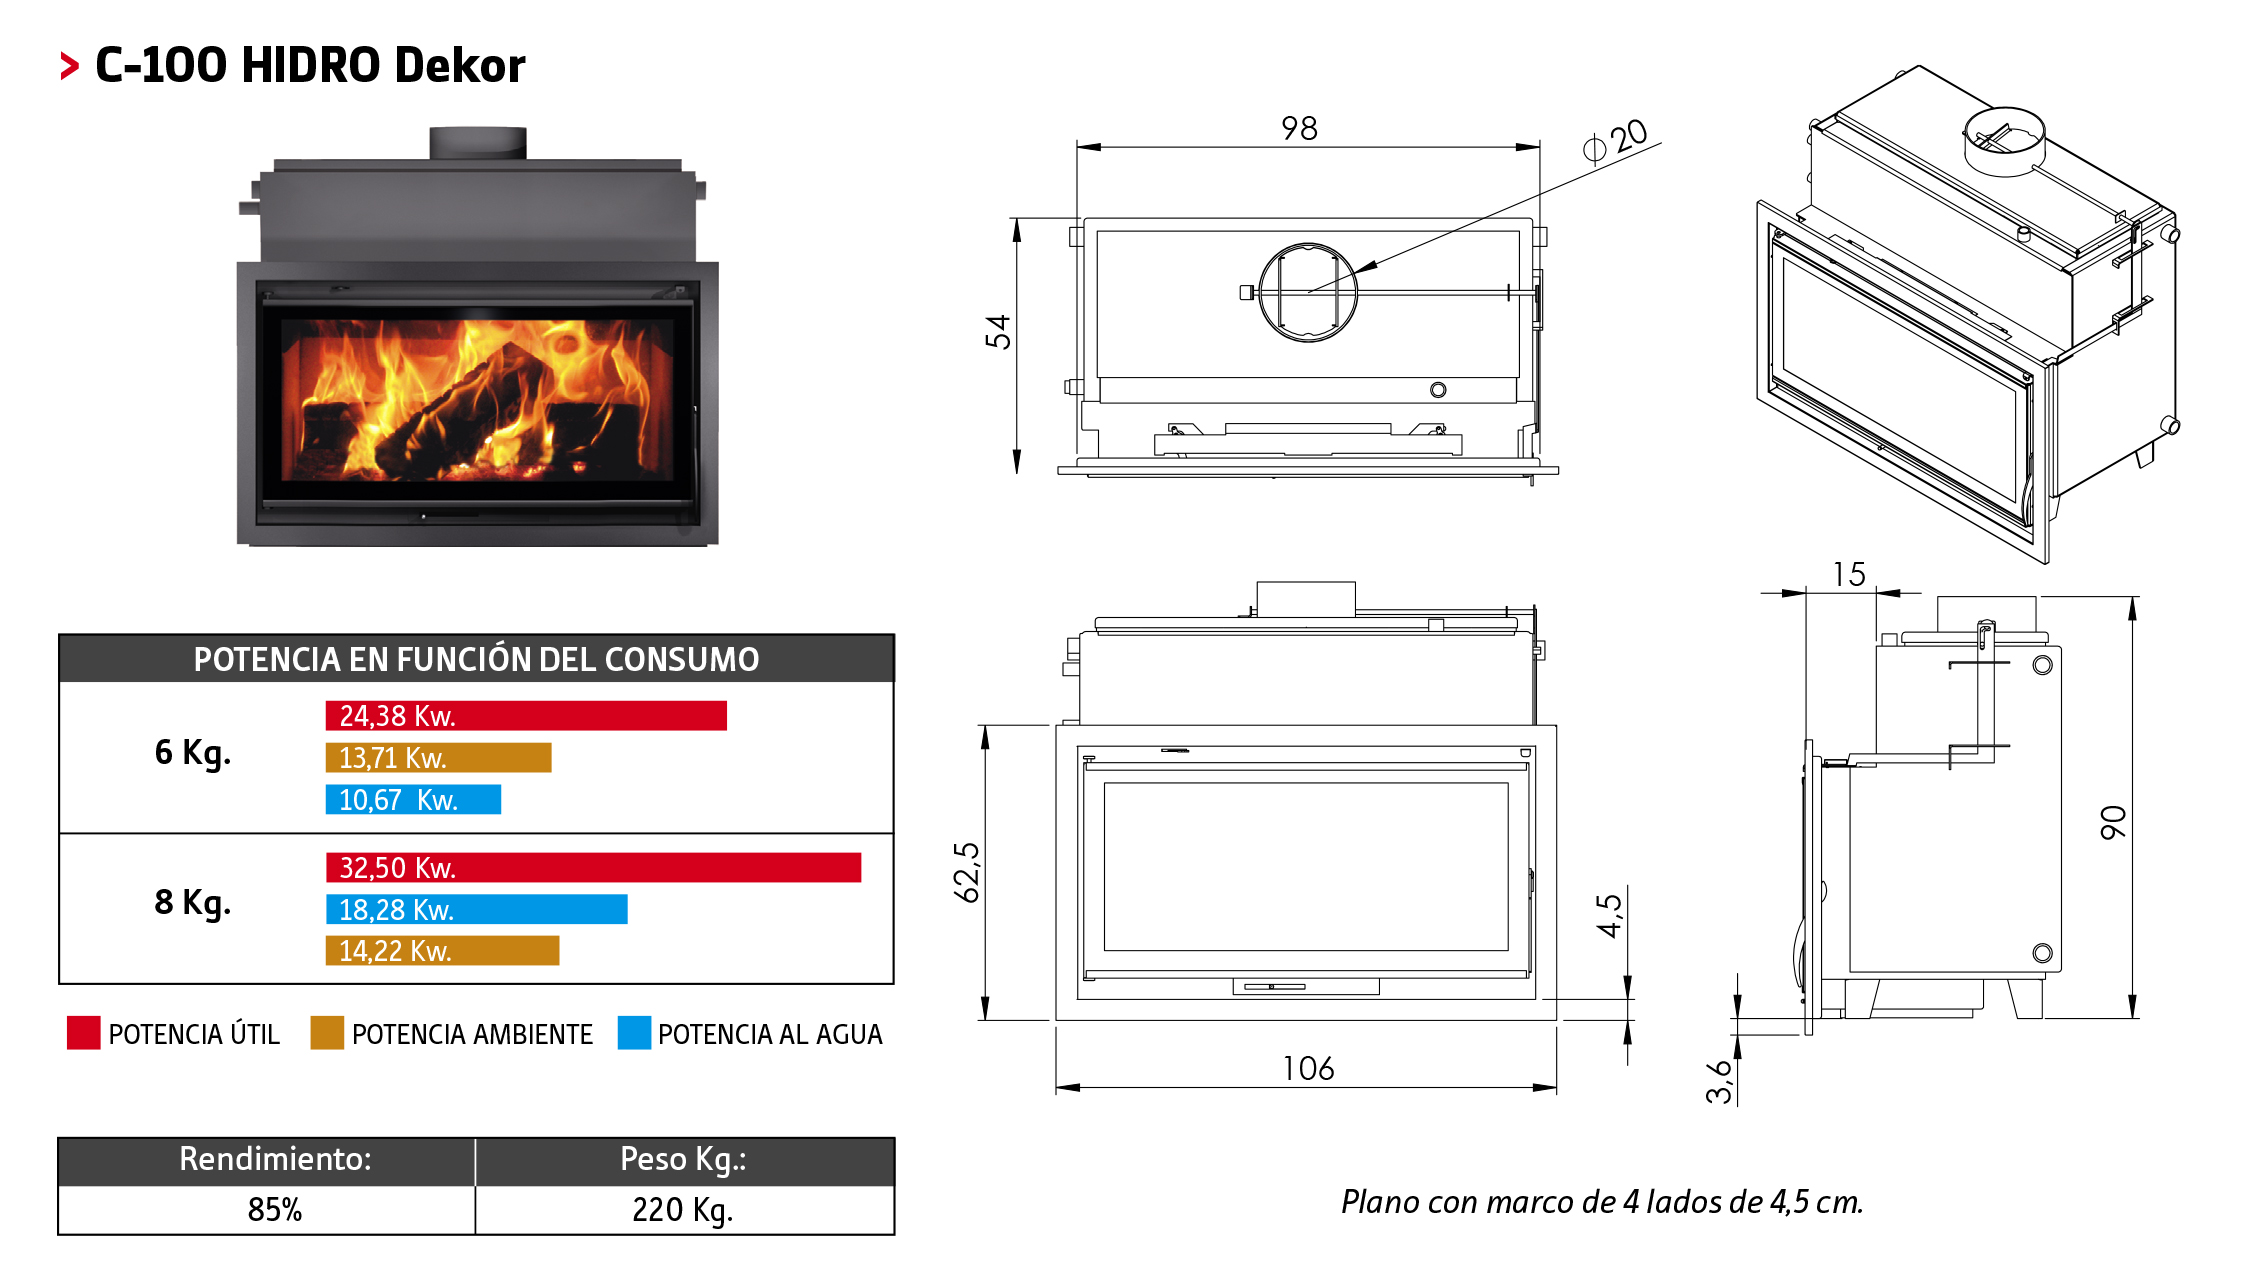 Características técnicas Carbel C-100 Hidro Dekor